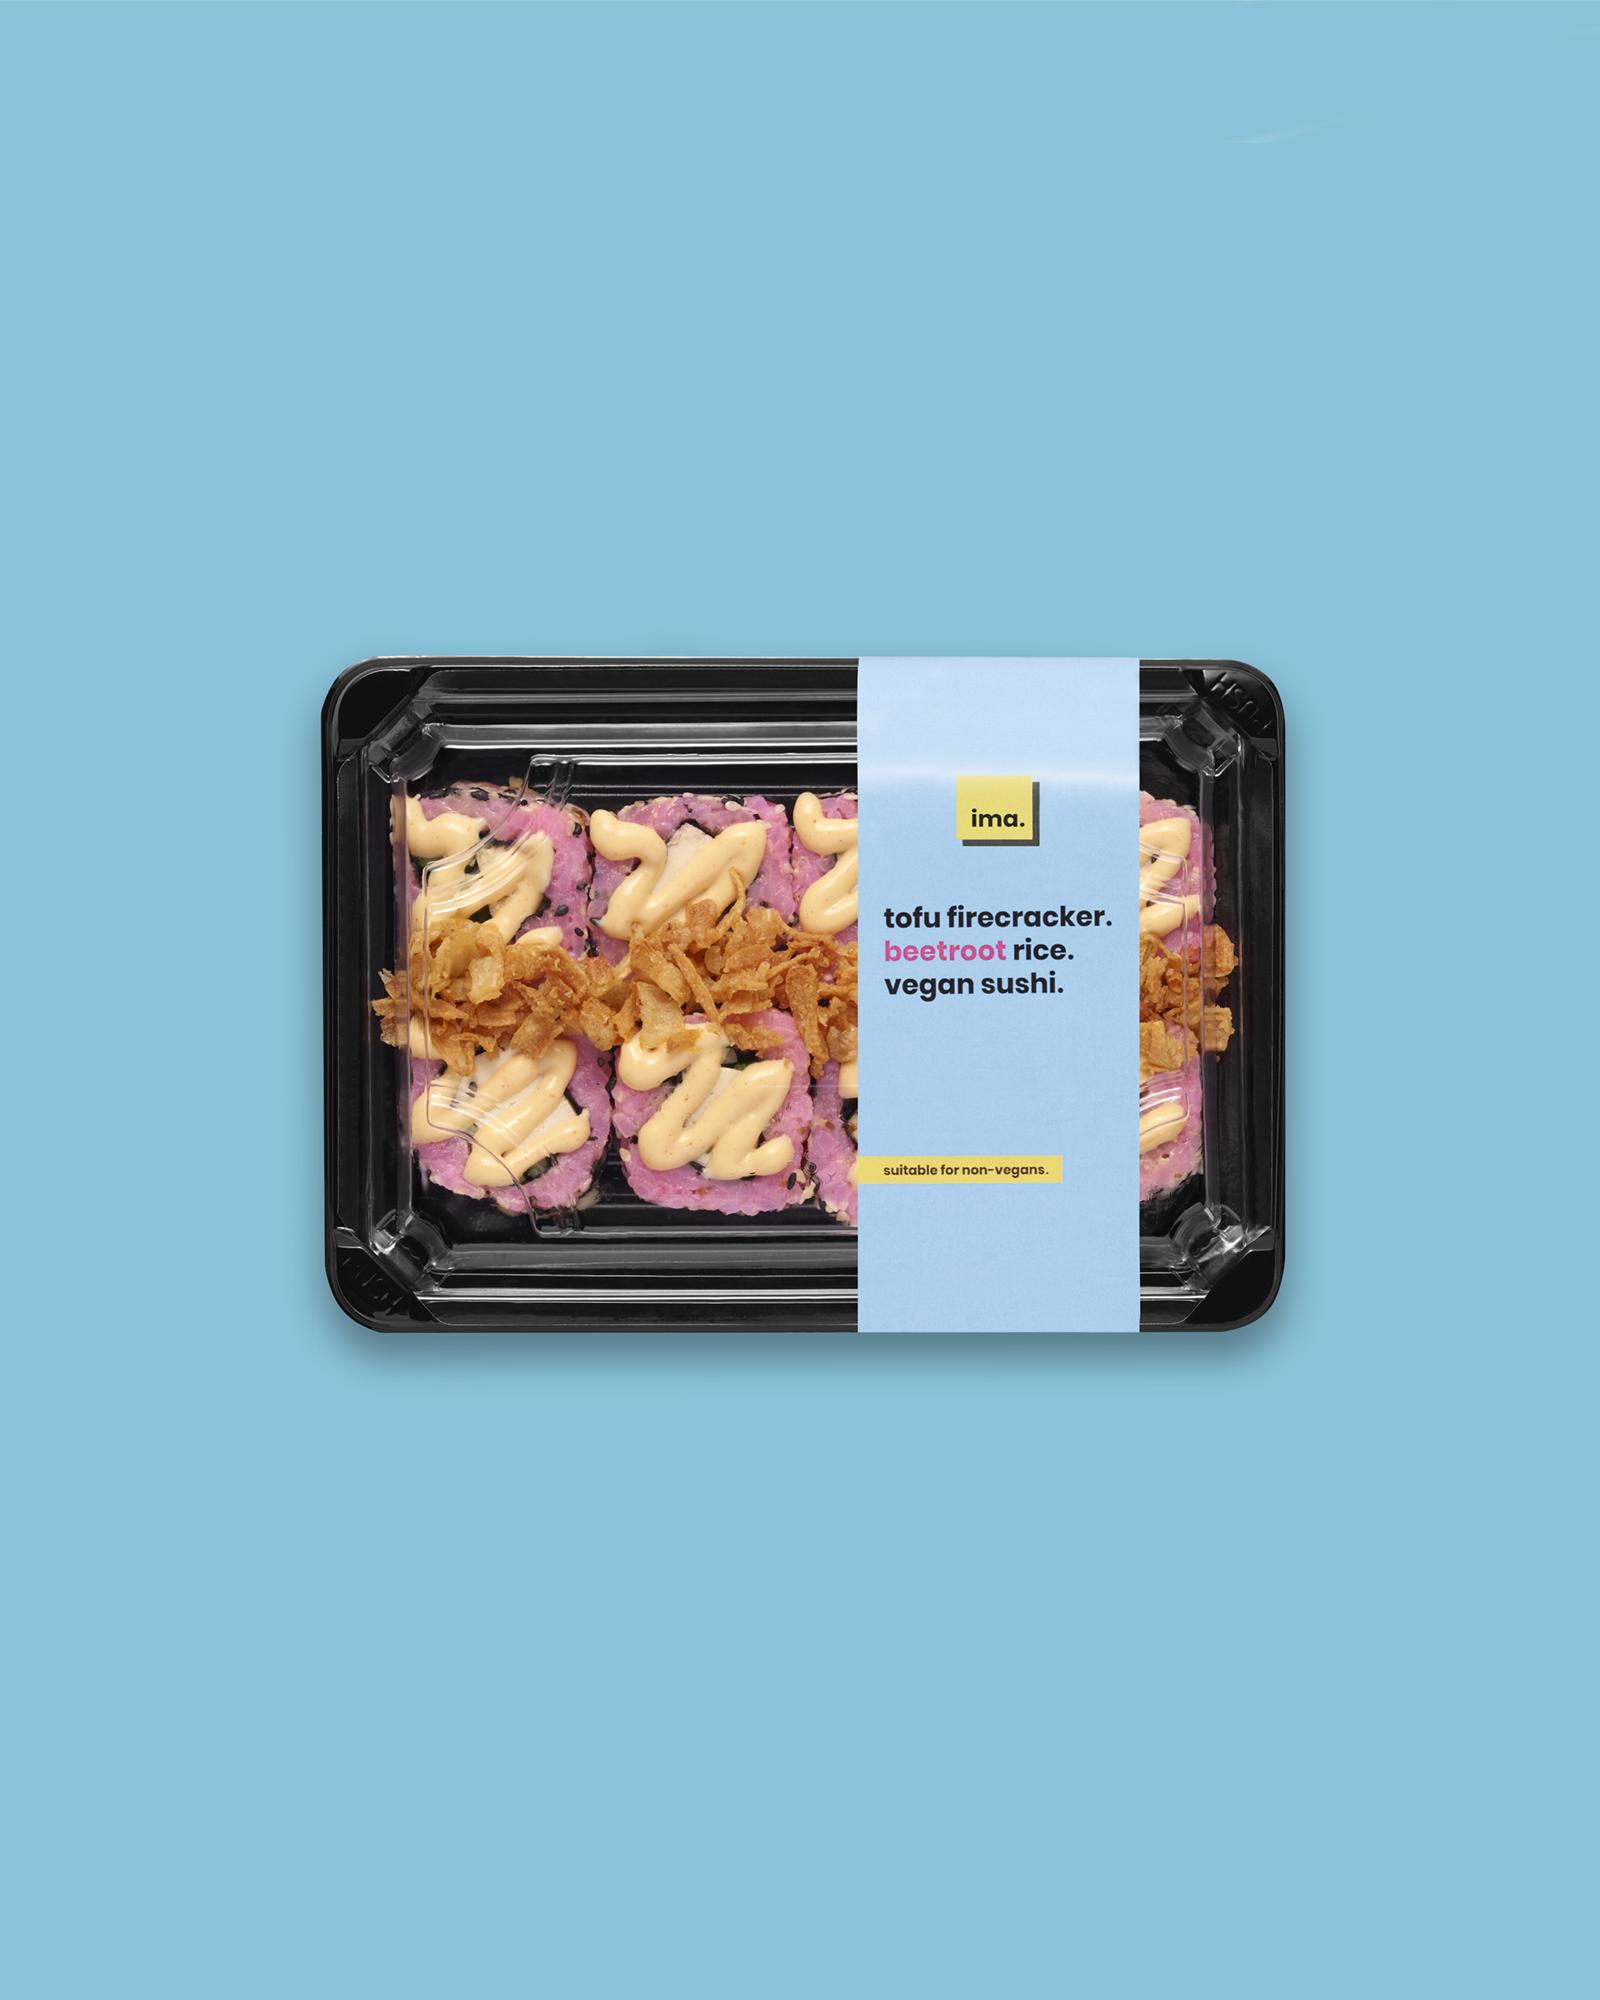 Tofu_Fire_Cracker_Blue.jpg